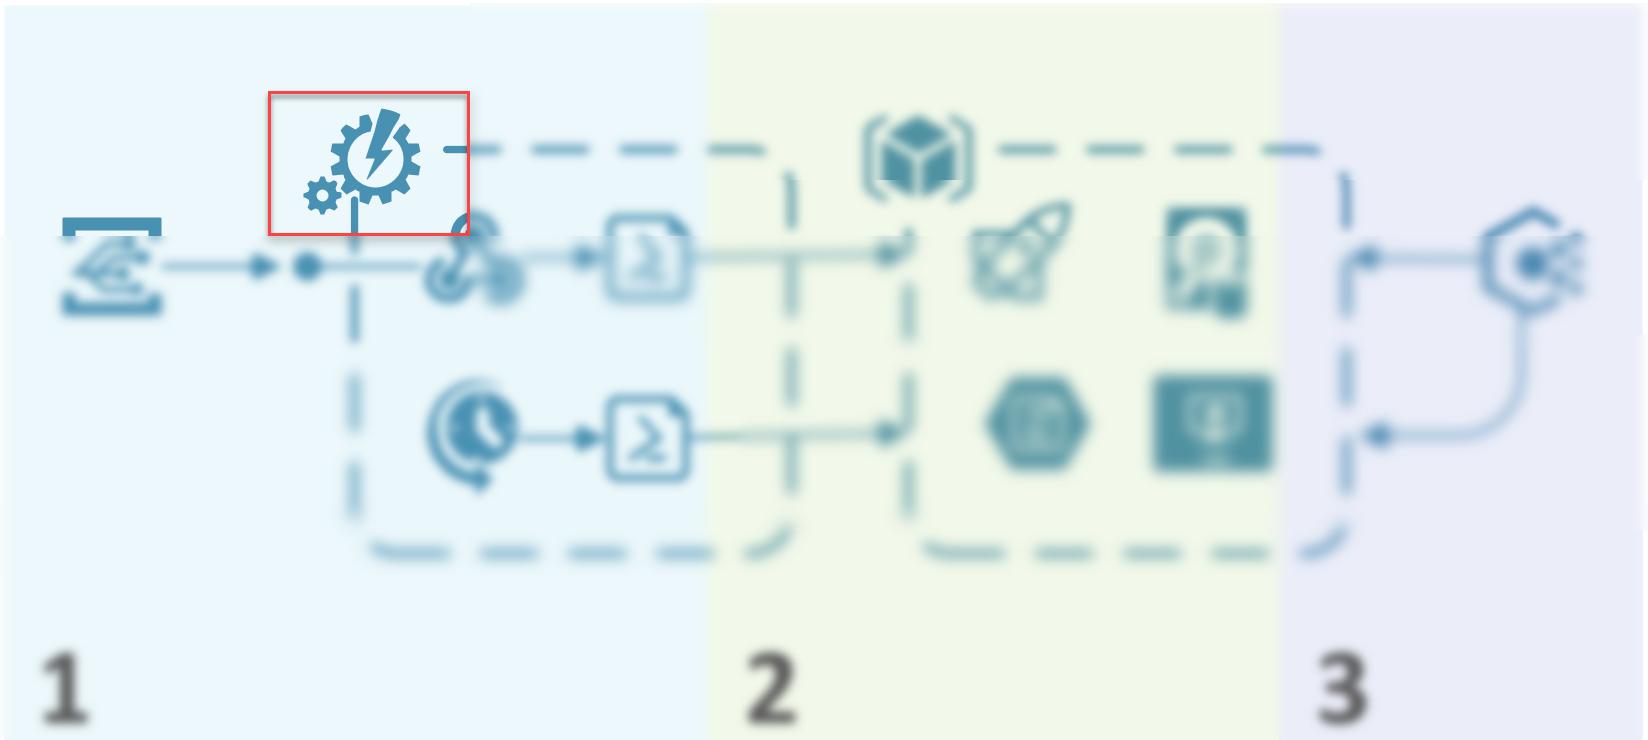 exe to msi converter free 2.0.0.0